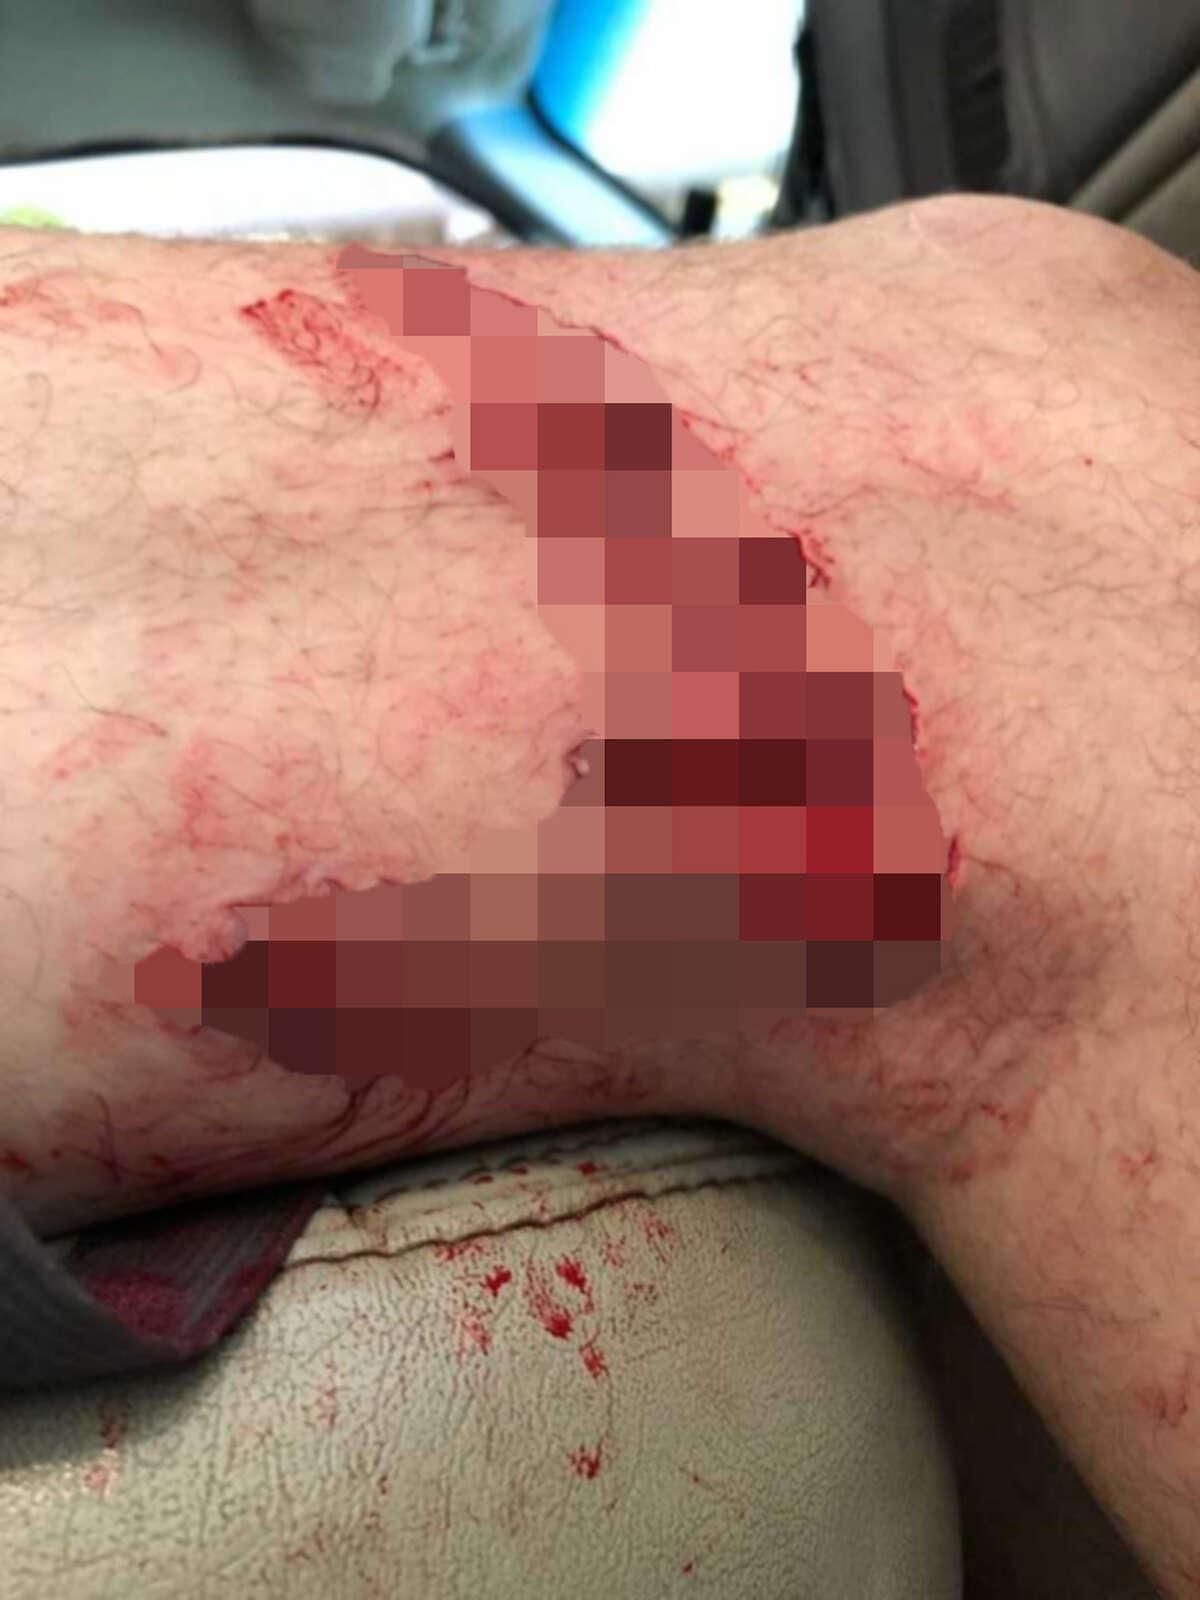 A 42-year old man was bitten by a shark near Crystal Beach on Thursday, August 9, 2018.